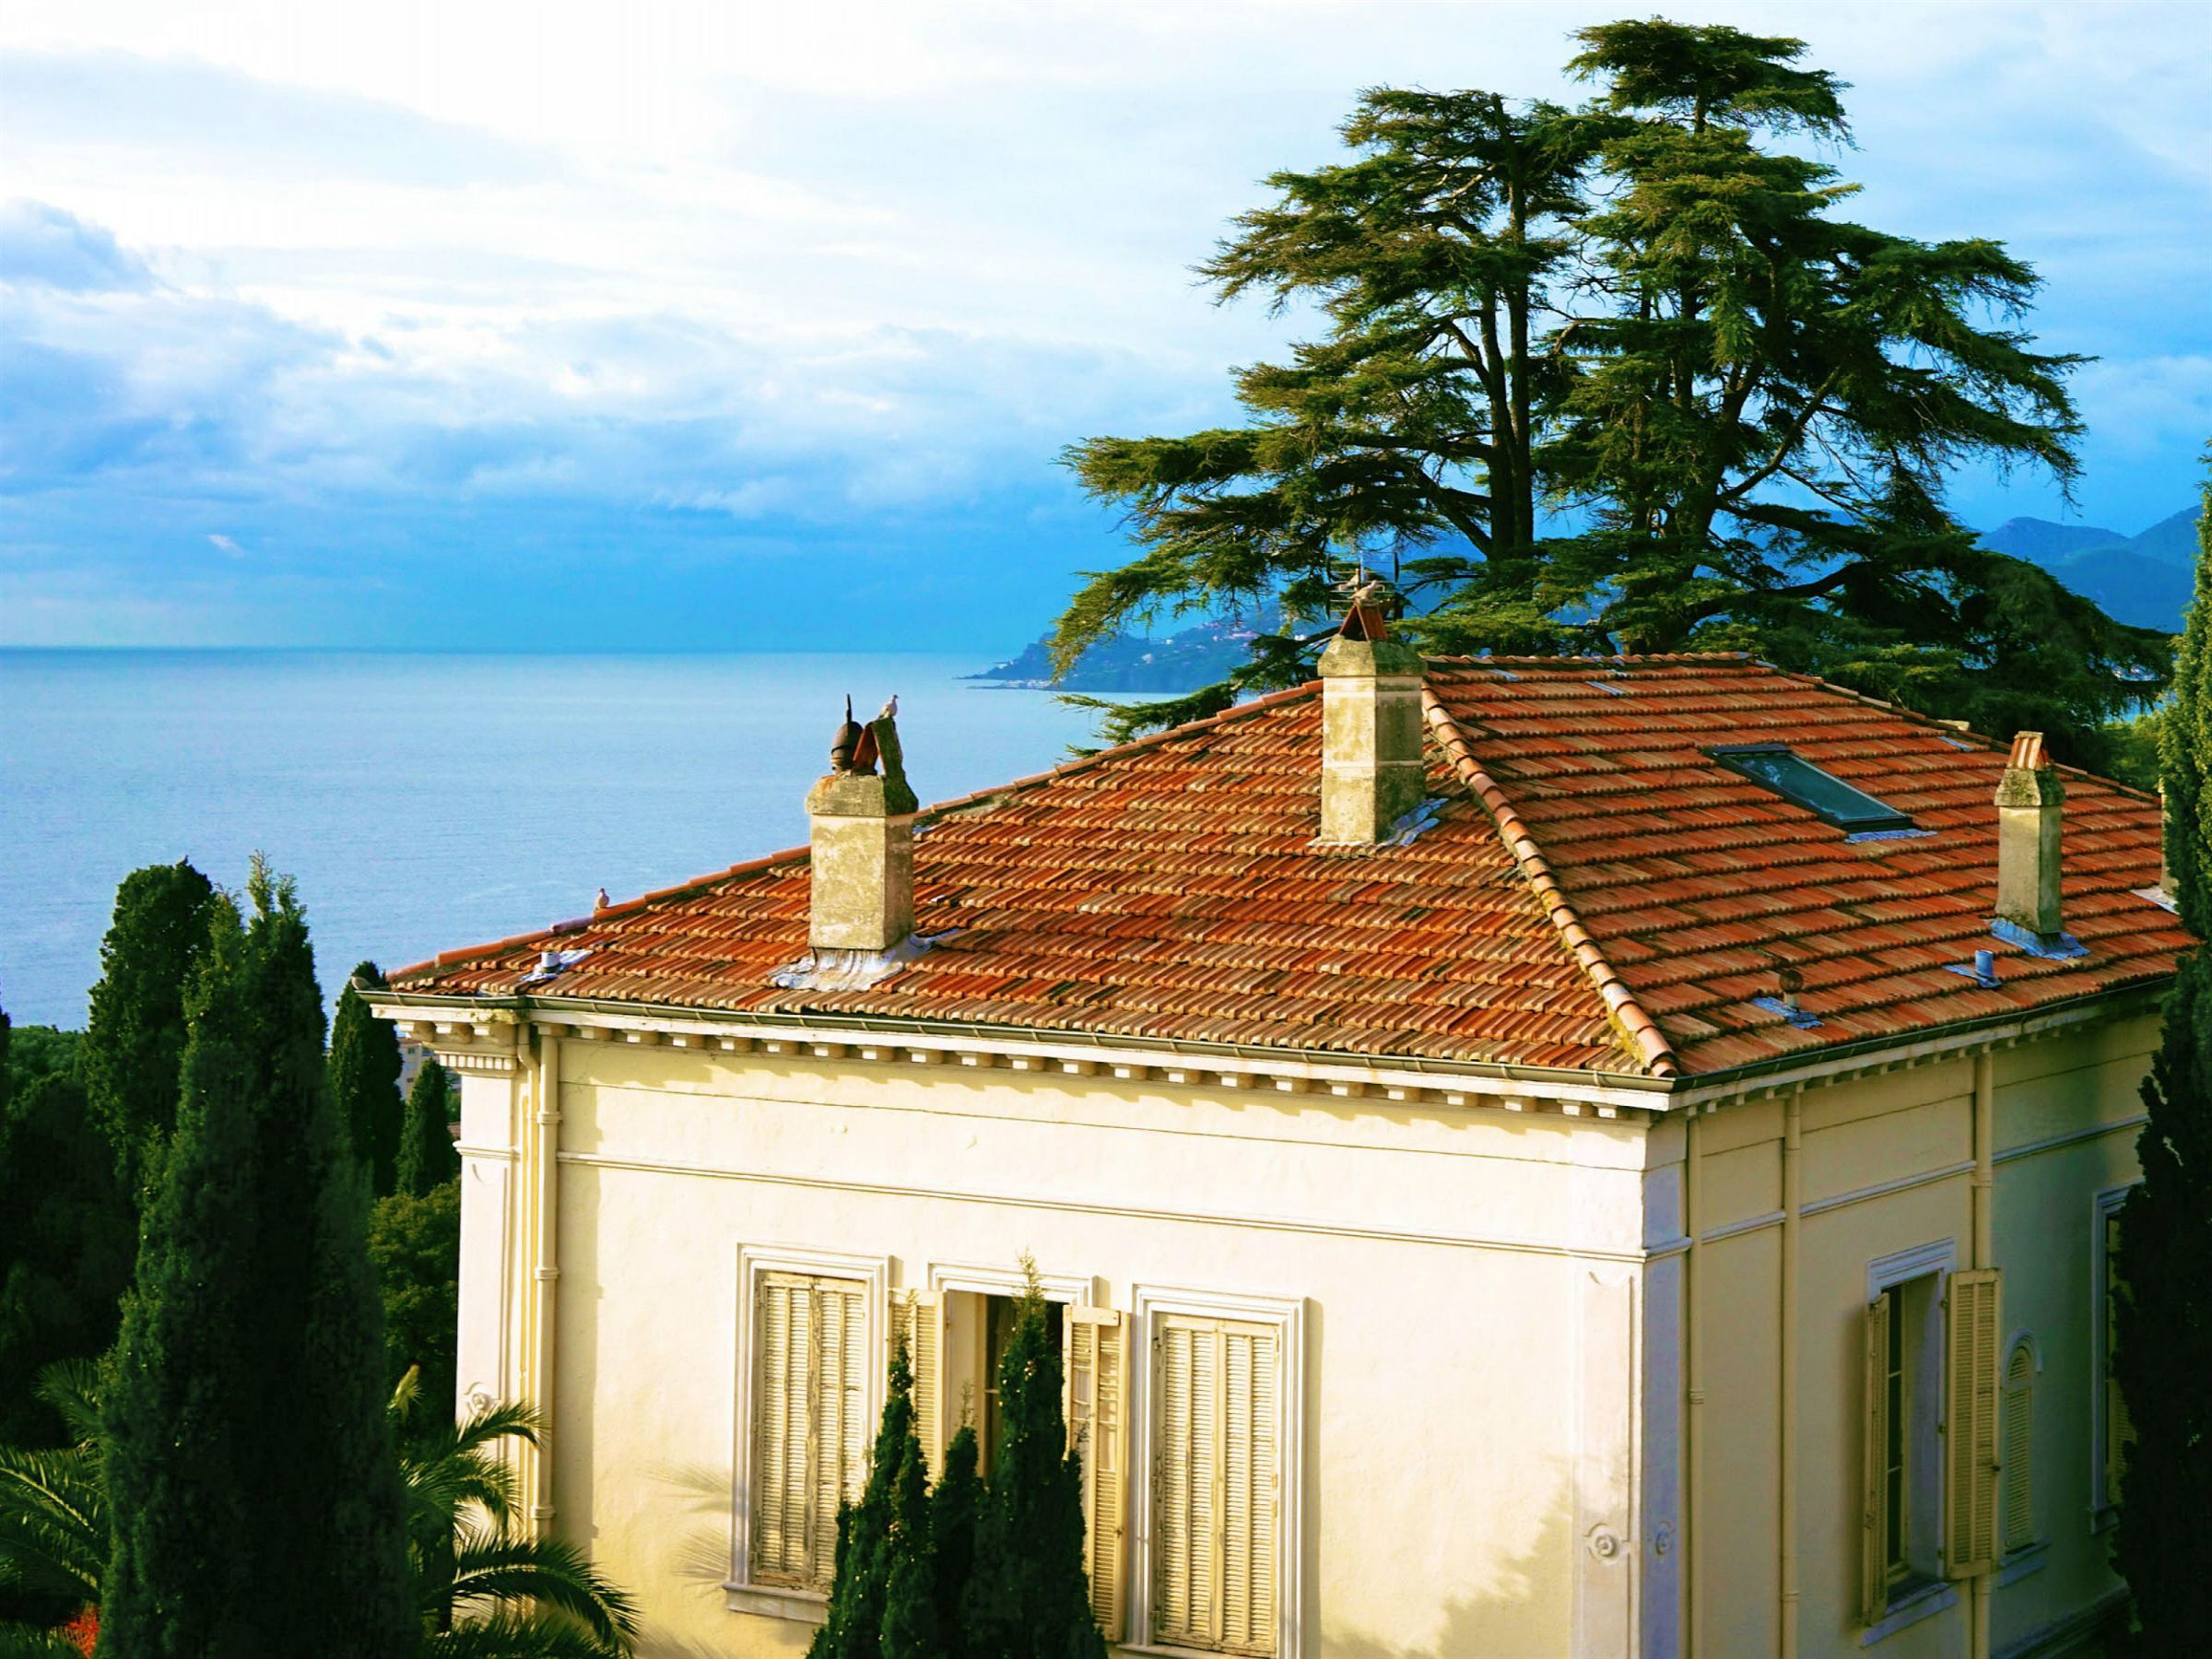 Casa Unifamiliar por un Venta en Cannes - Authentic property - Panoramic sea view Cannes, Provincia - Alpes - Costa Azul 06400 Francia